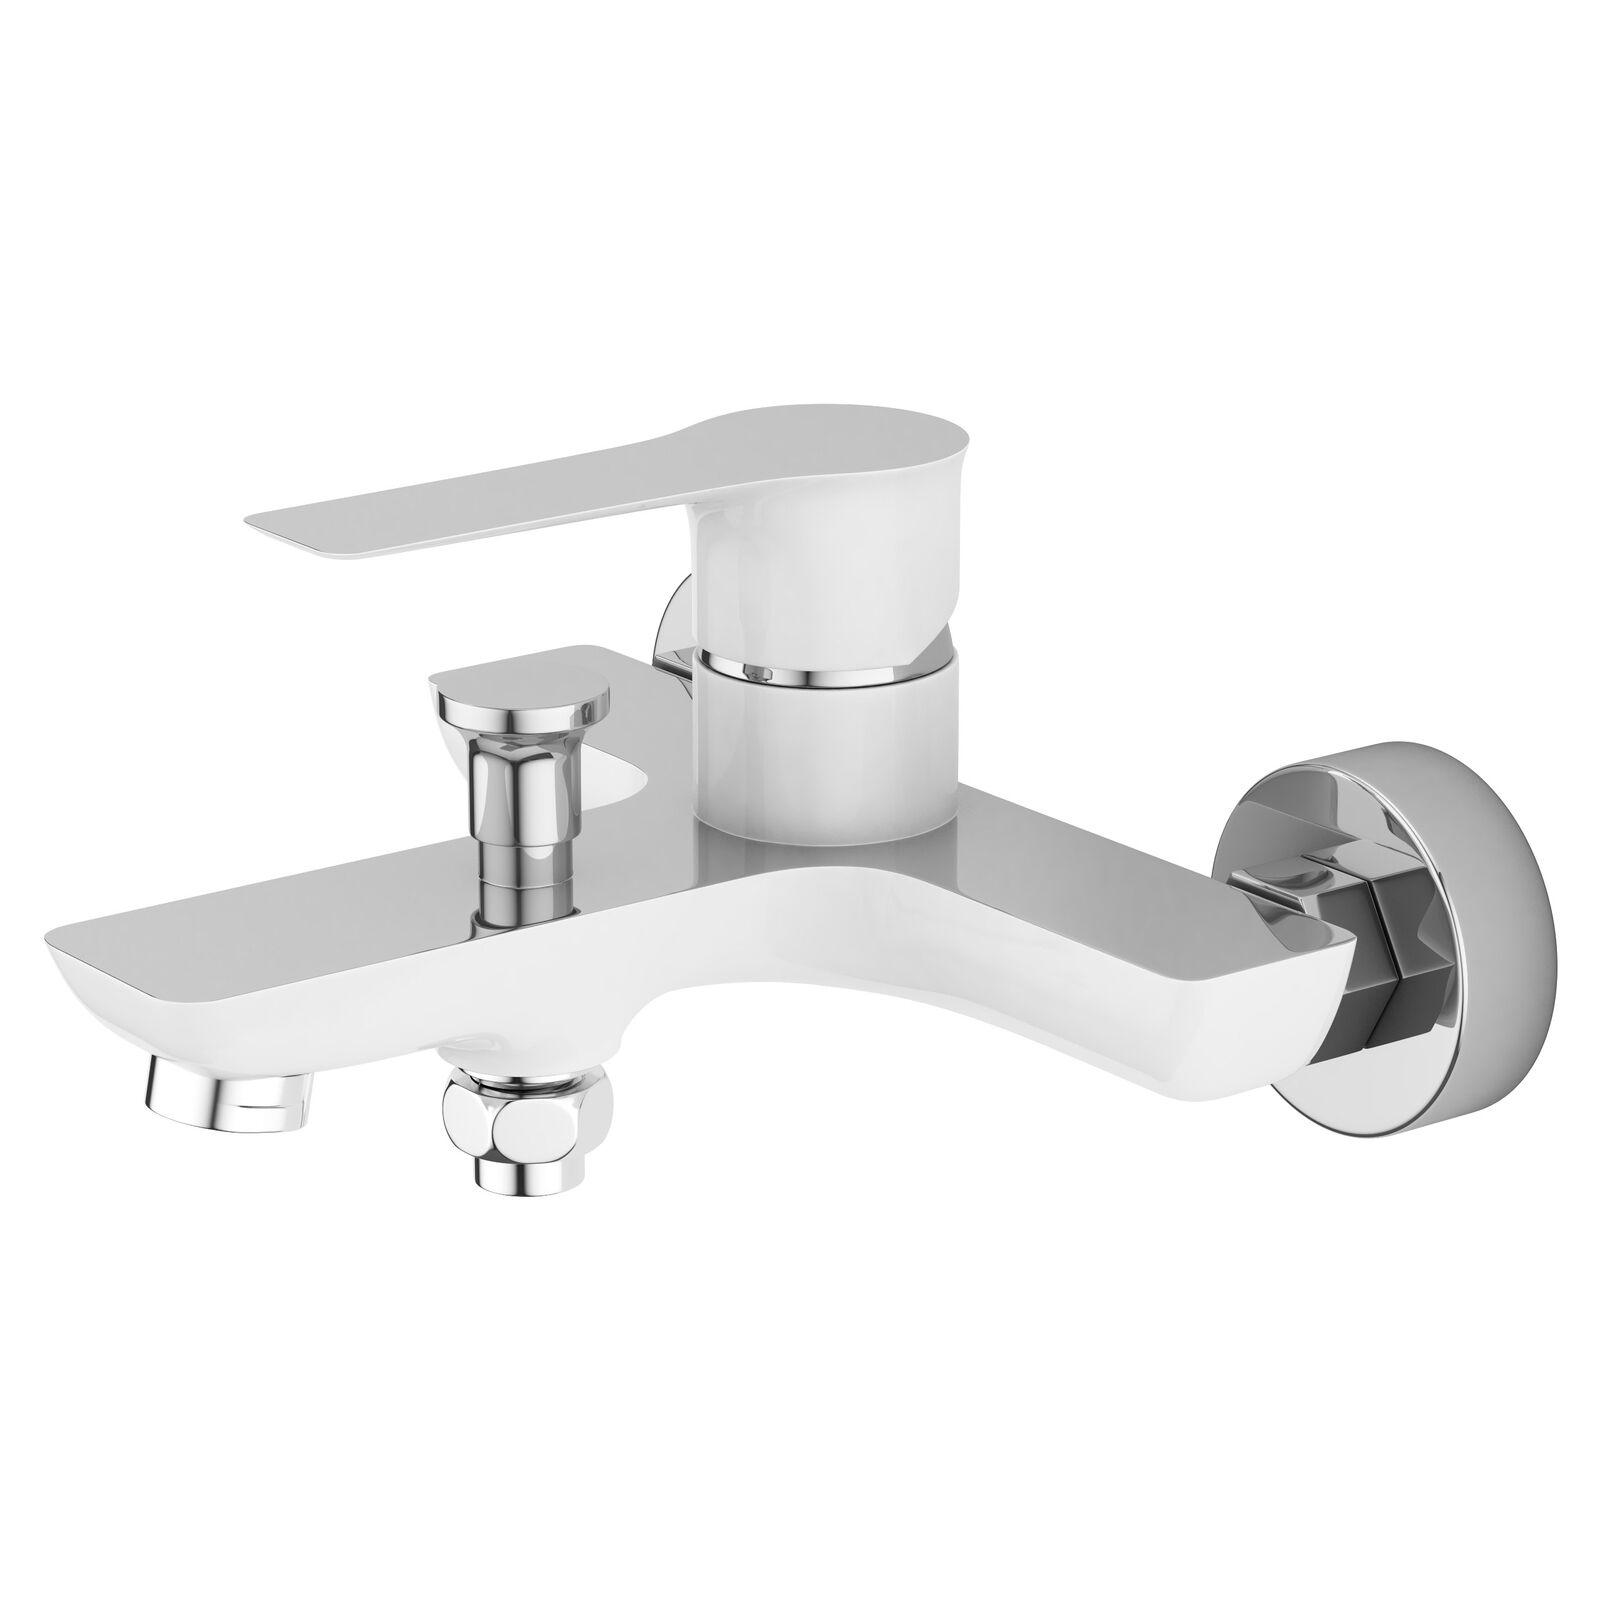 Wannenarmatur Armatur Weiß & Chrom Badewannenarmatur Einhandmischer Einhandmischer Einhandmischer Badewanne dc4d71